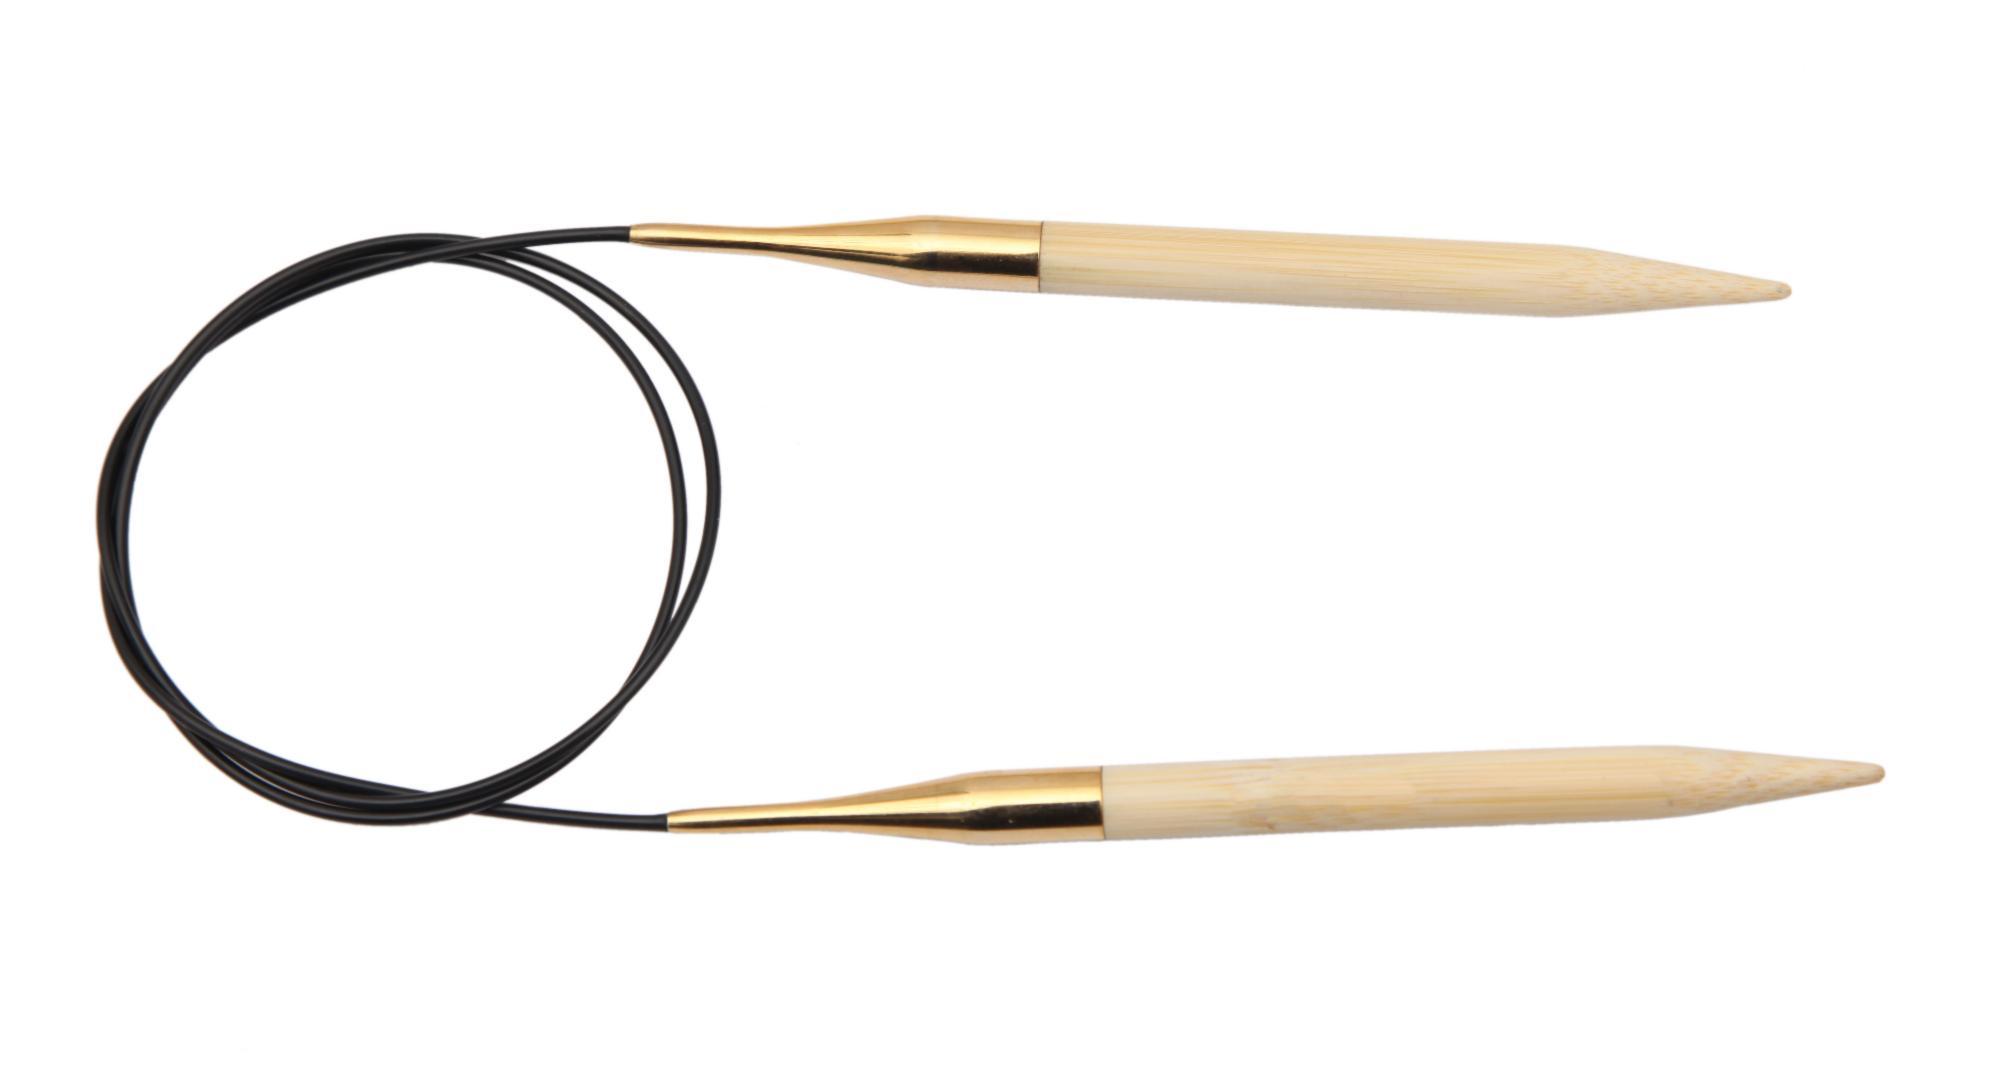 Спицы круговые 60 см Bamboo KnitPro, 22223, 2.50 мм